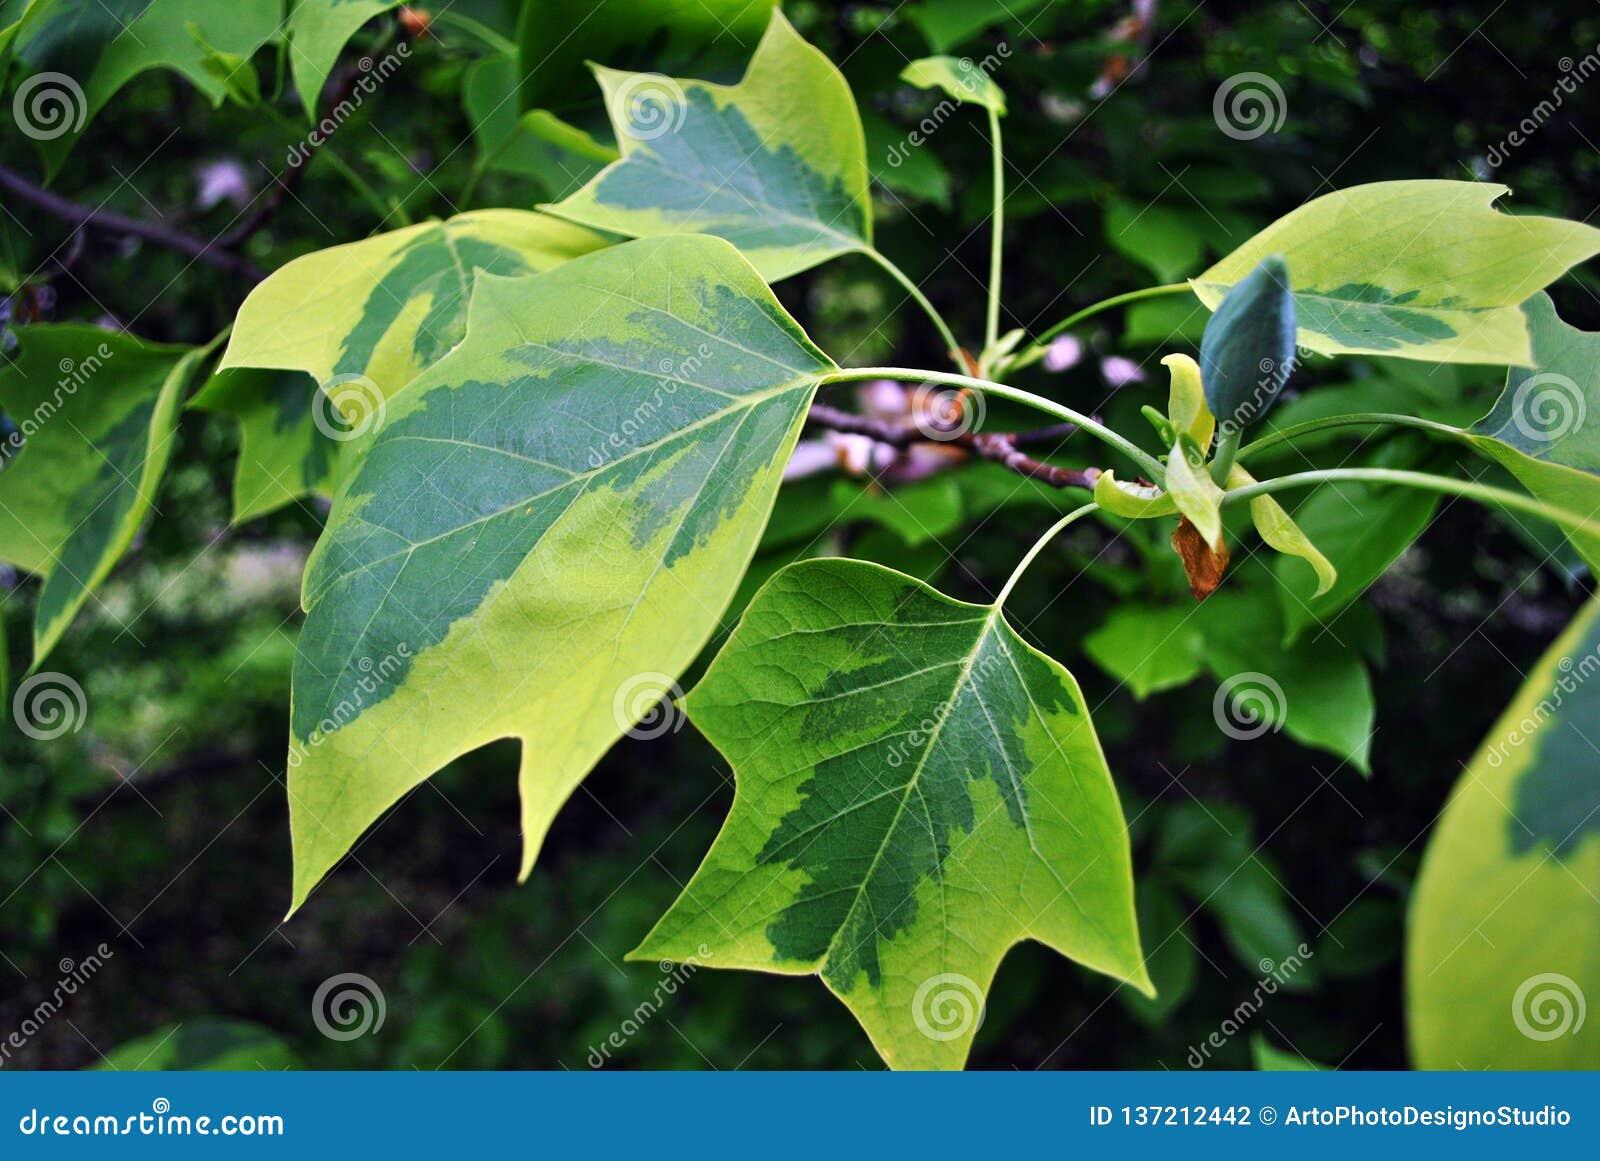 Liriodendron Tulipifera Aureomarginatum Amerikanischer Tulpenbaum